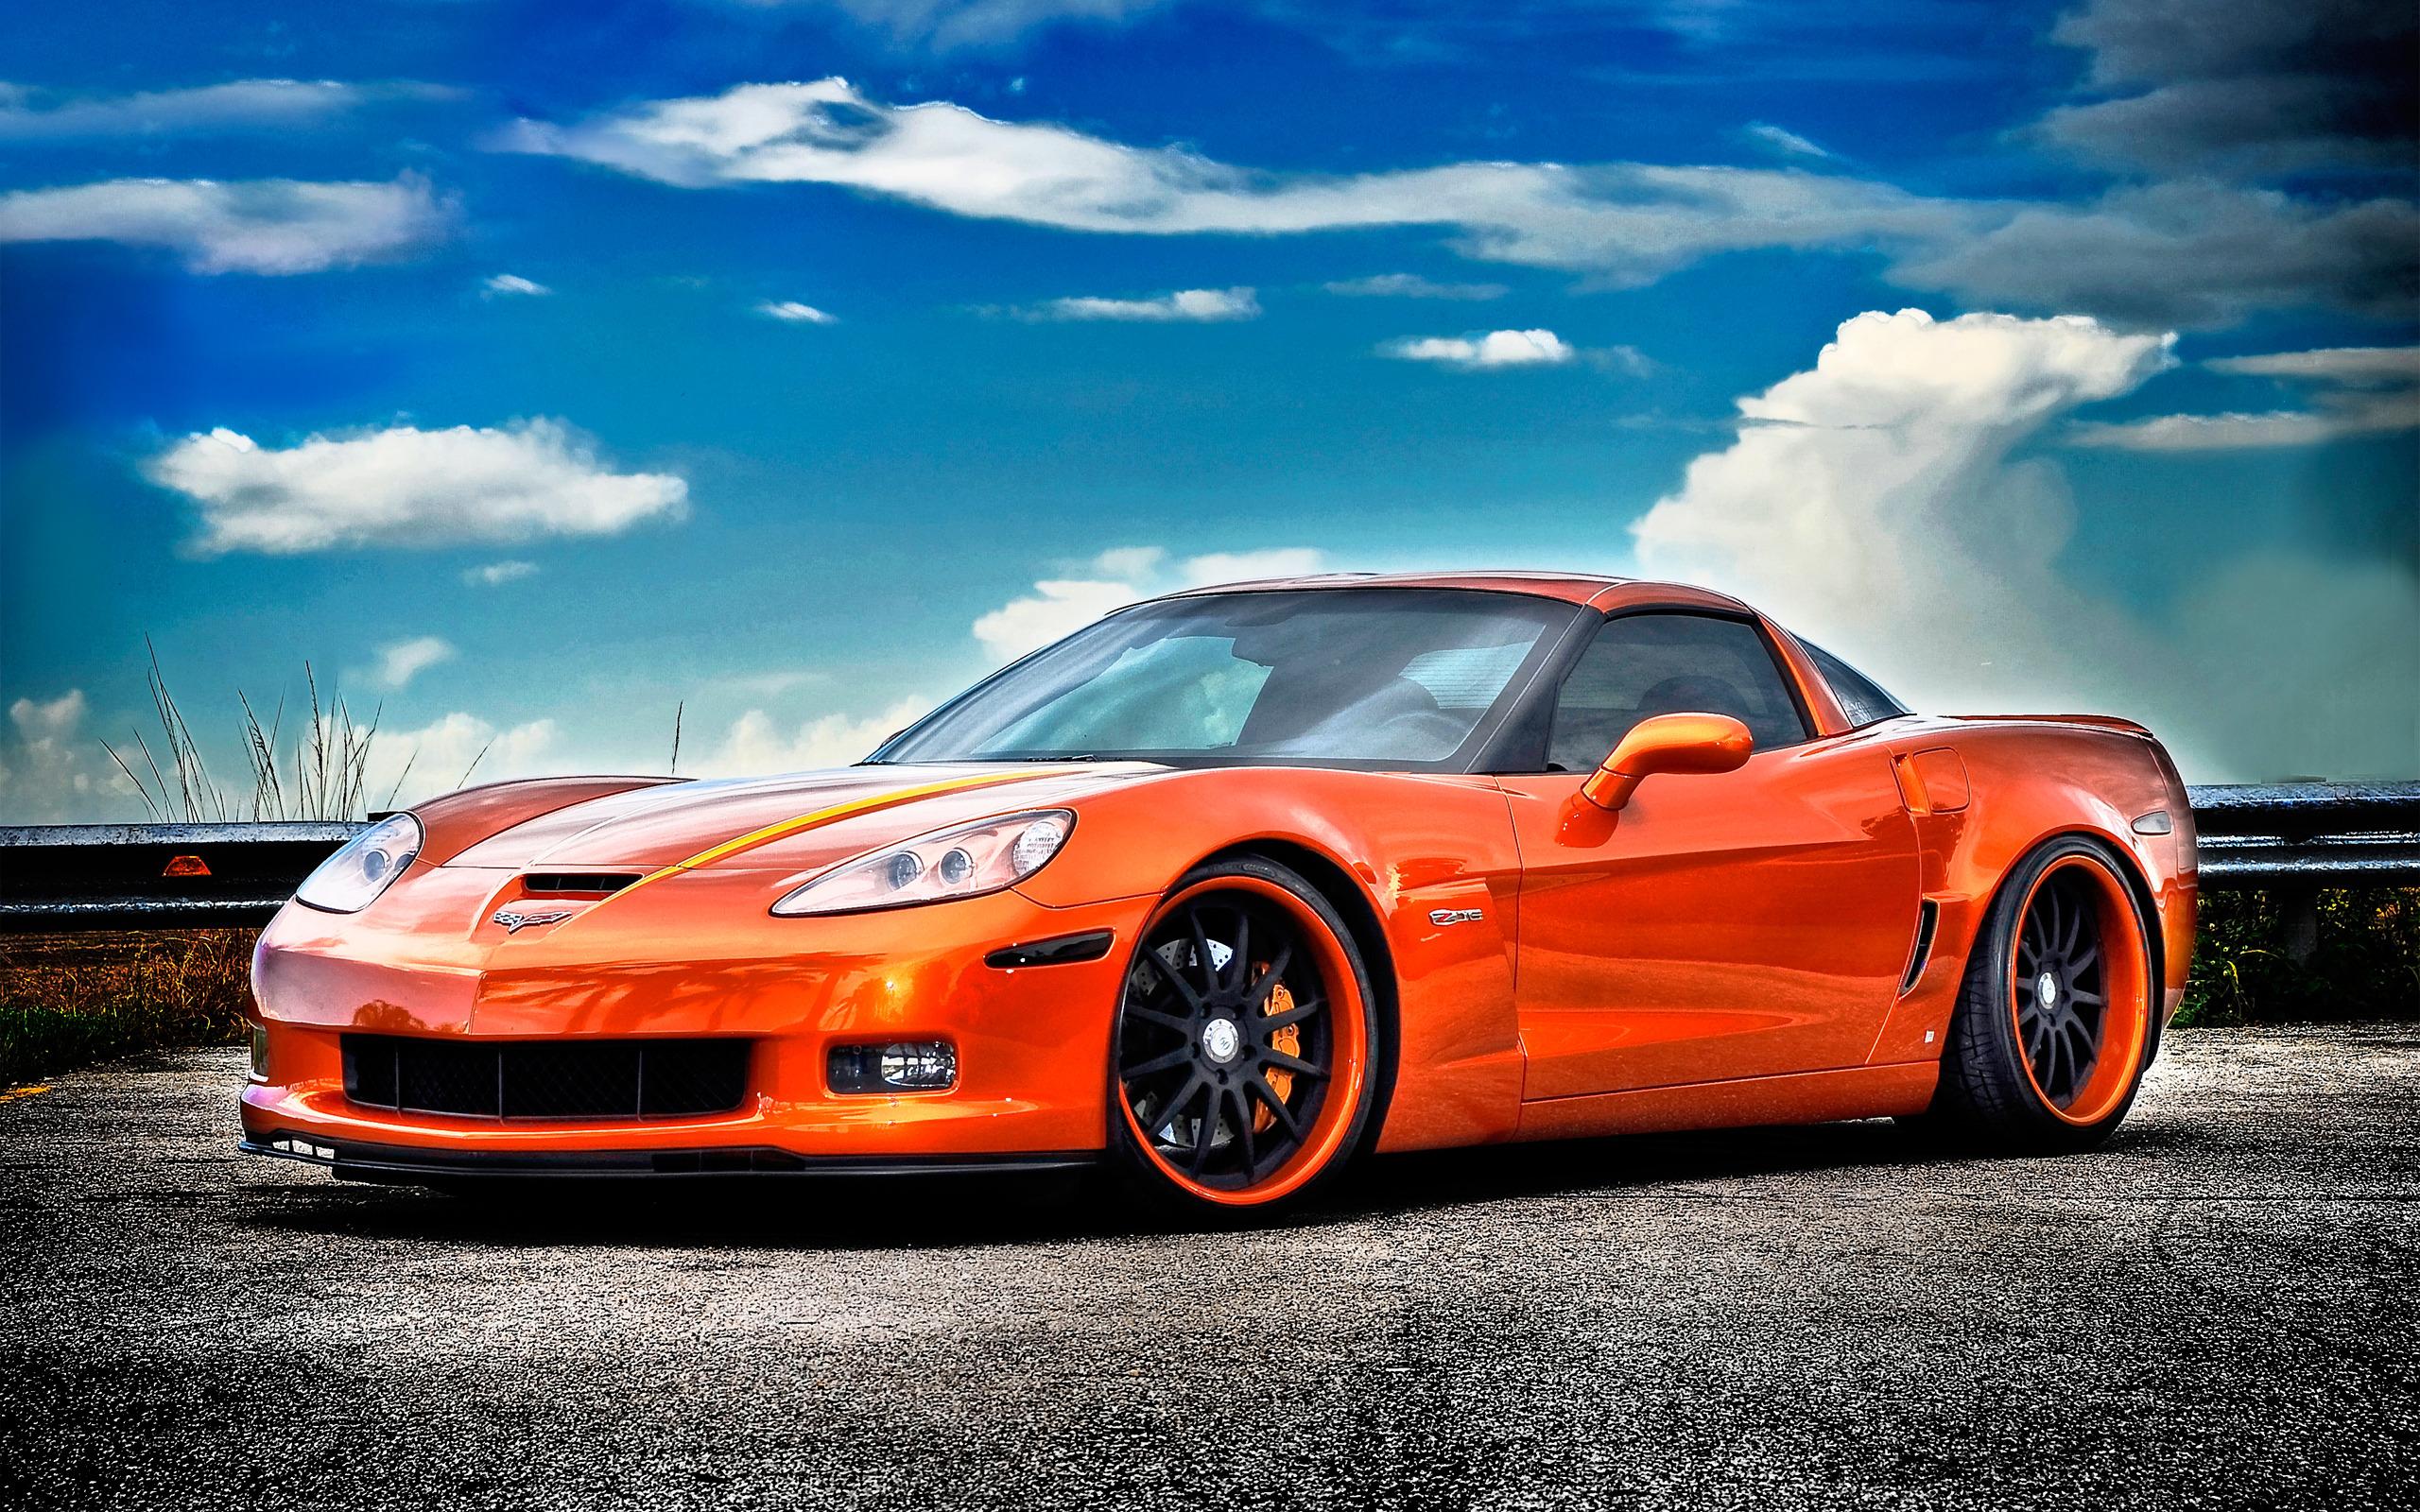 Chevrolet Corvette Z06 Wallpaper Orange HD